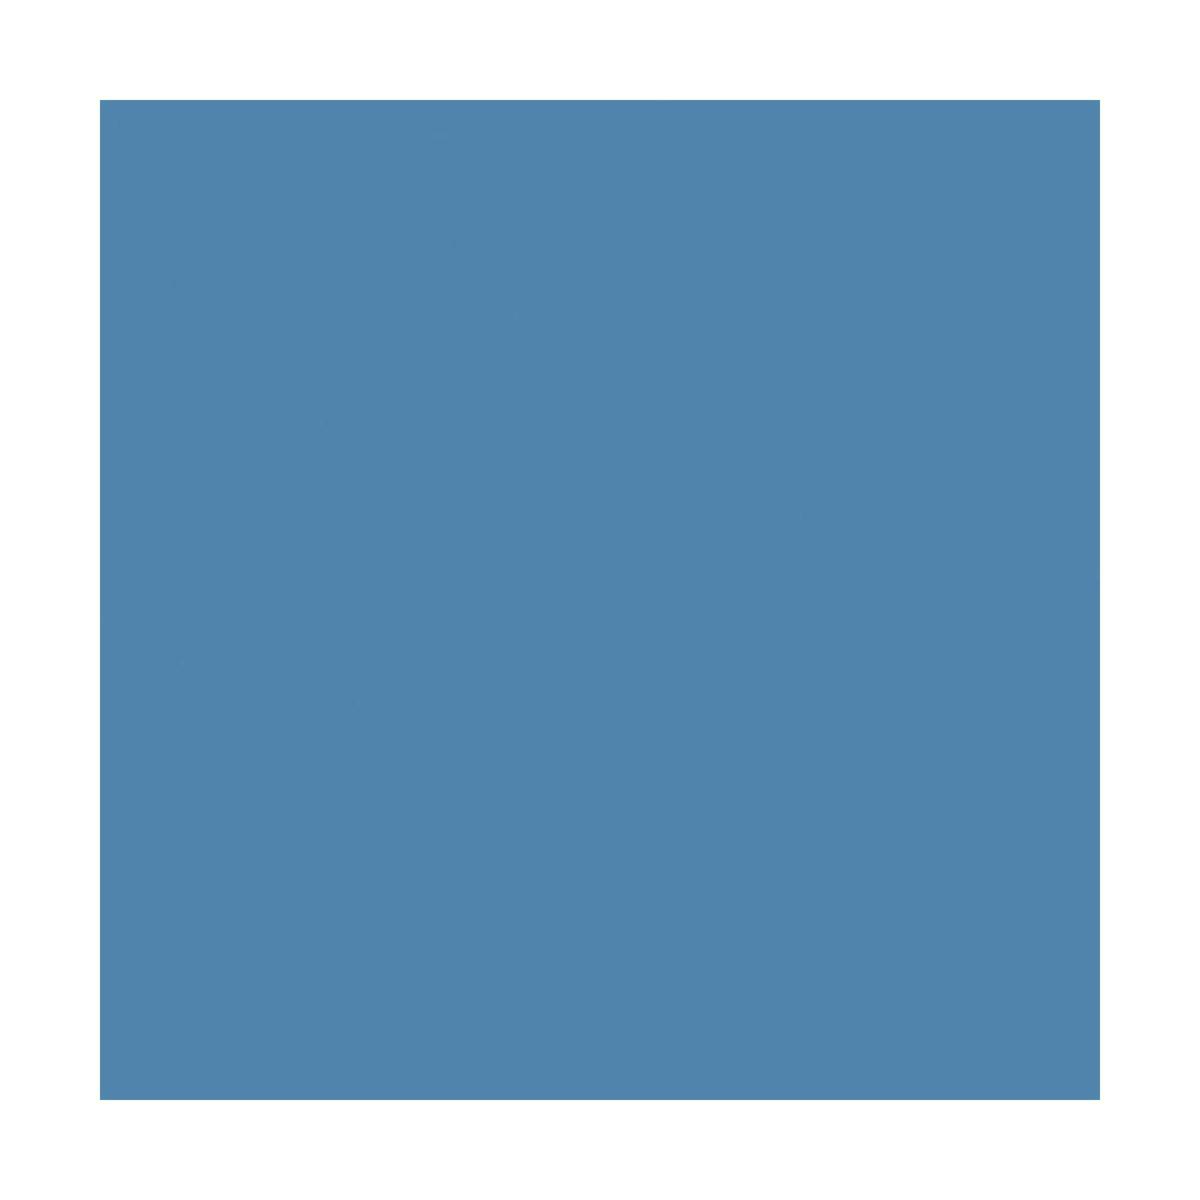 bd_backgrounds_161_patriot_blue_02